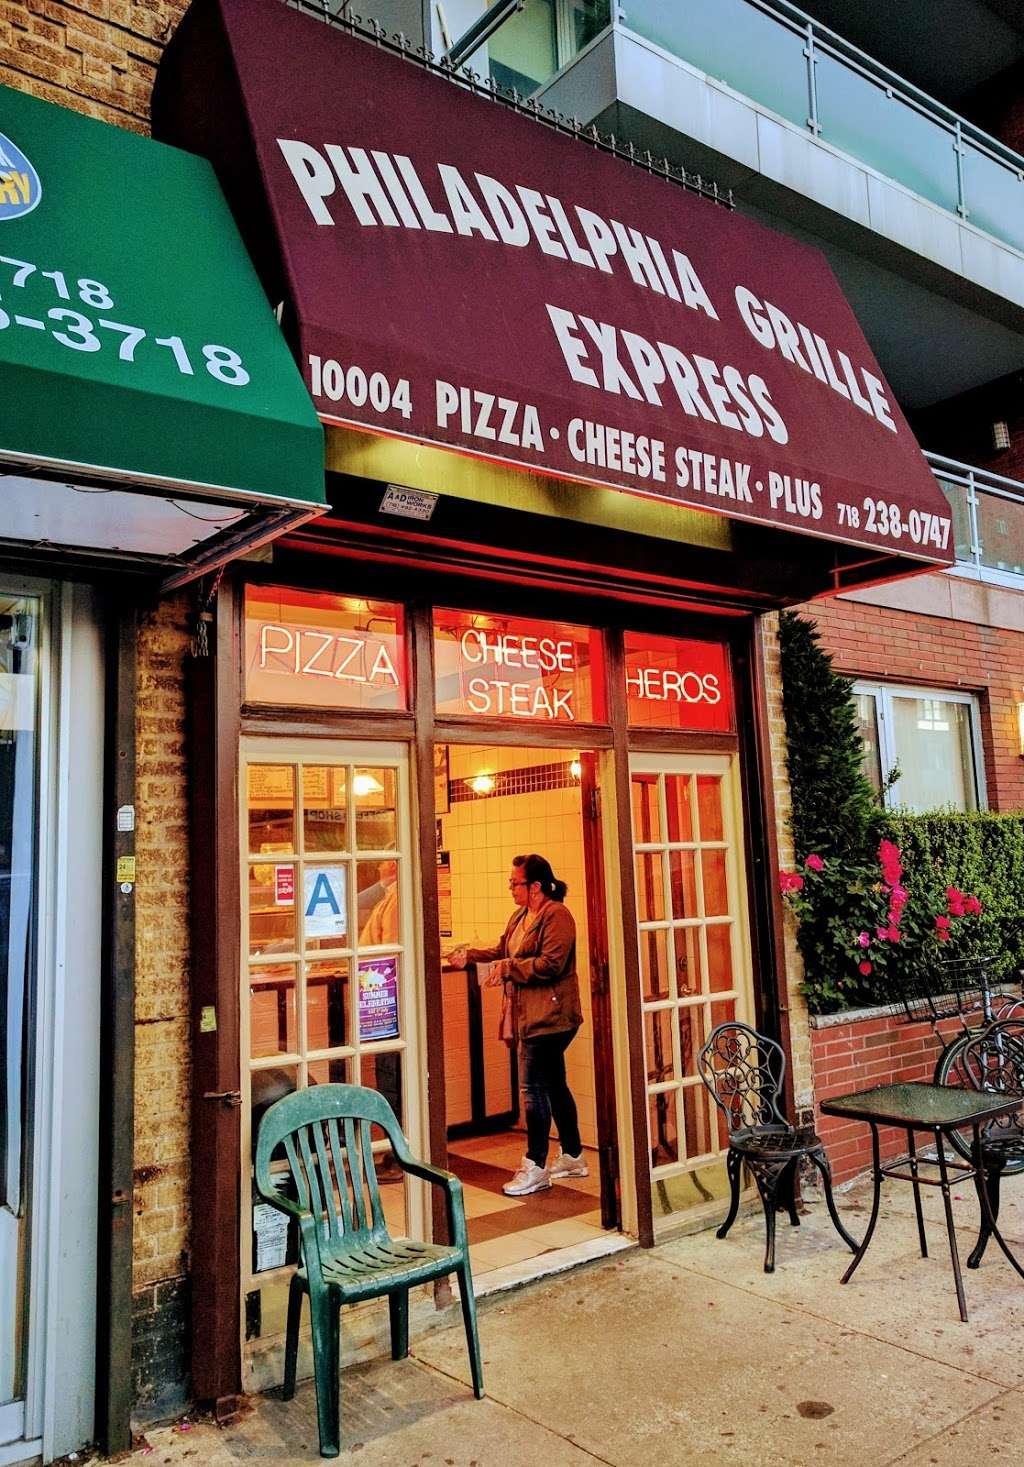 Philadelphia Grille - restaurant  | Photo 1 of 9 | Address: 10004 4th Ave, Brooklyn, NY 11209, USA | Phone: (718) 238-0747